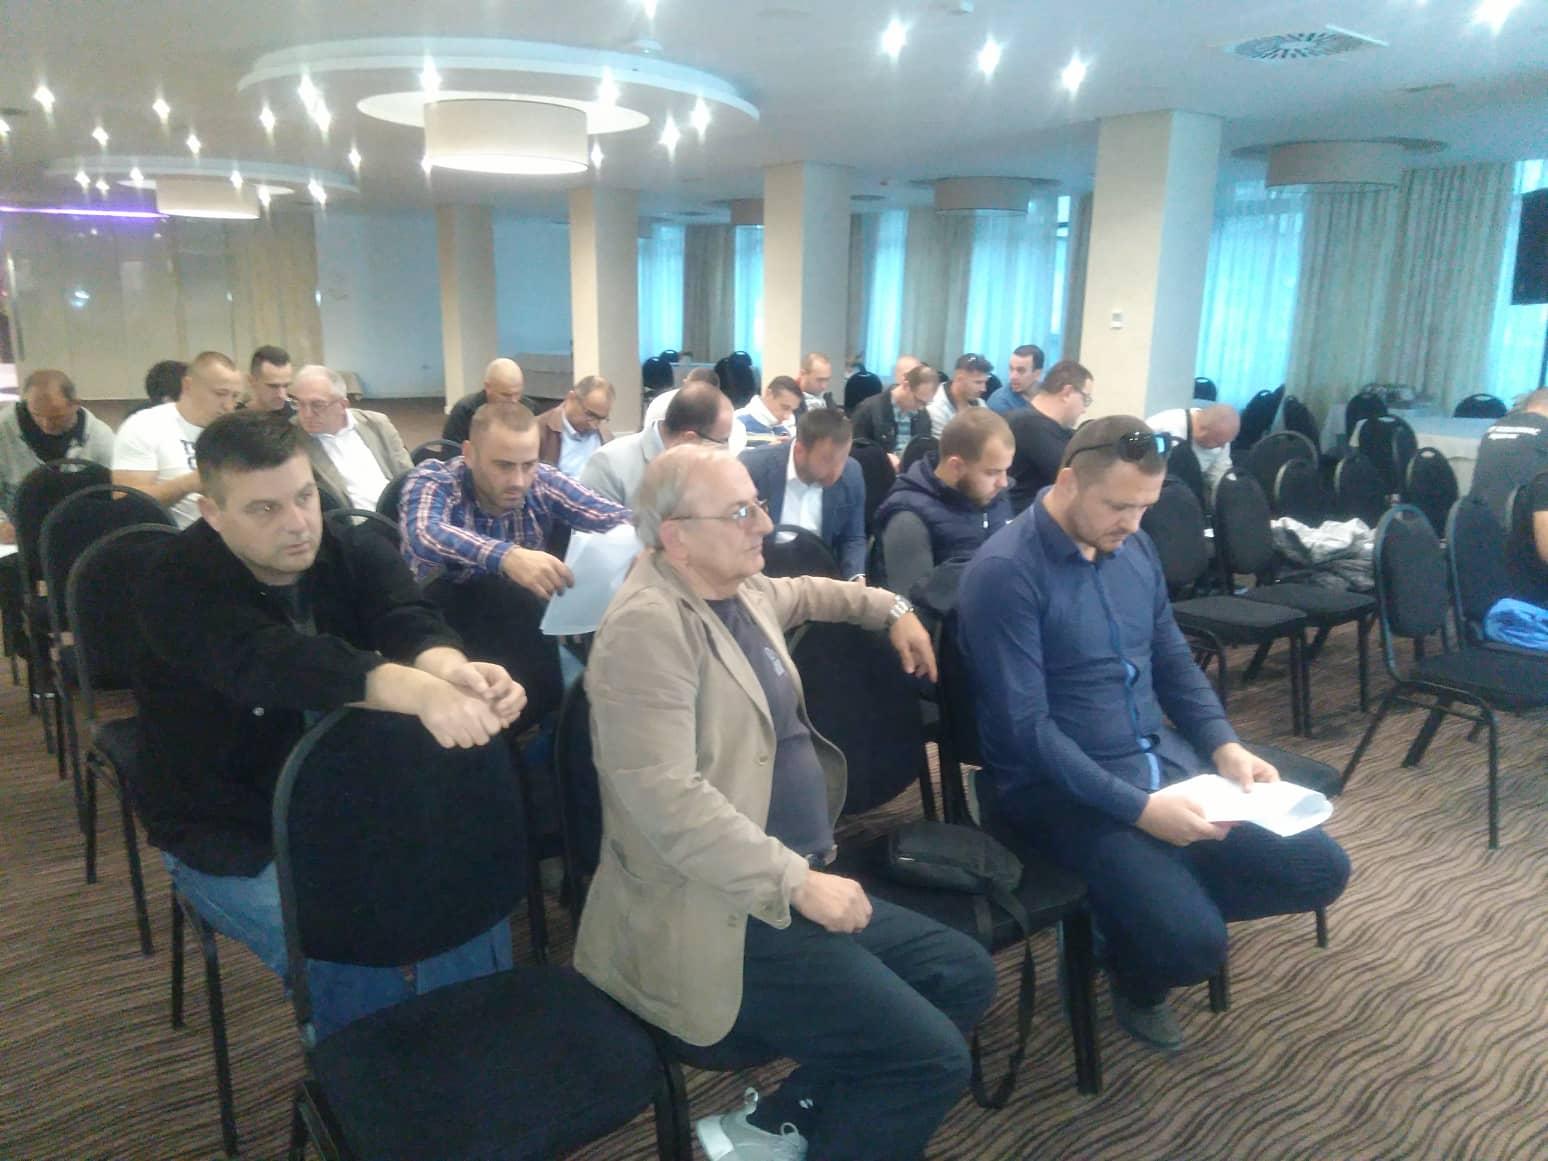 Konferencija futsal klubova: FS RIS nije upoznat sa promenama u sistemu takmičenja!